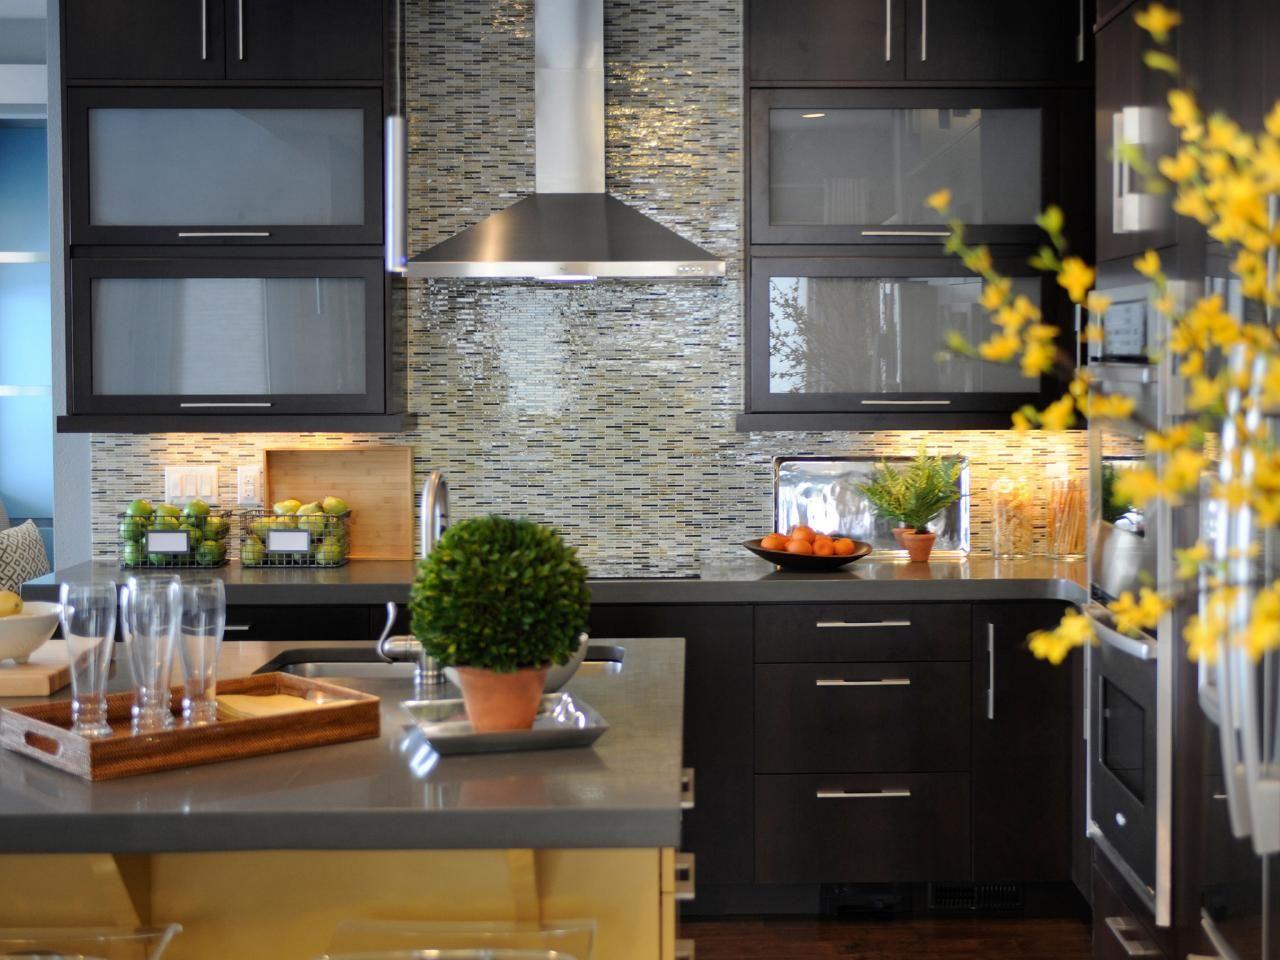 Kitchen Backsplash Tile Ideas  Best Kitchen Backsplash Hgtv And Best Kitchen Backsplash Tile Designs Pictures Review